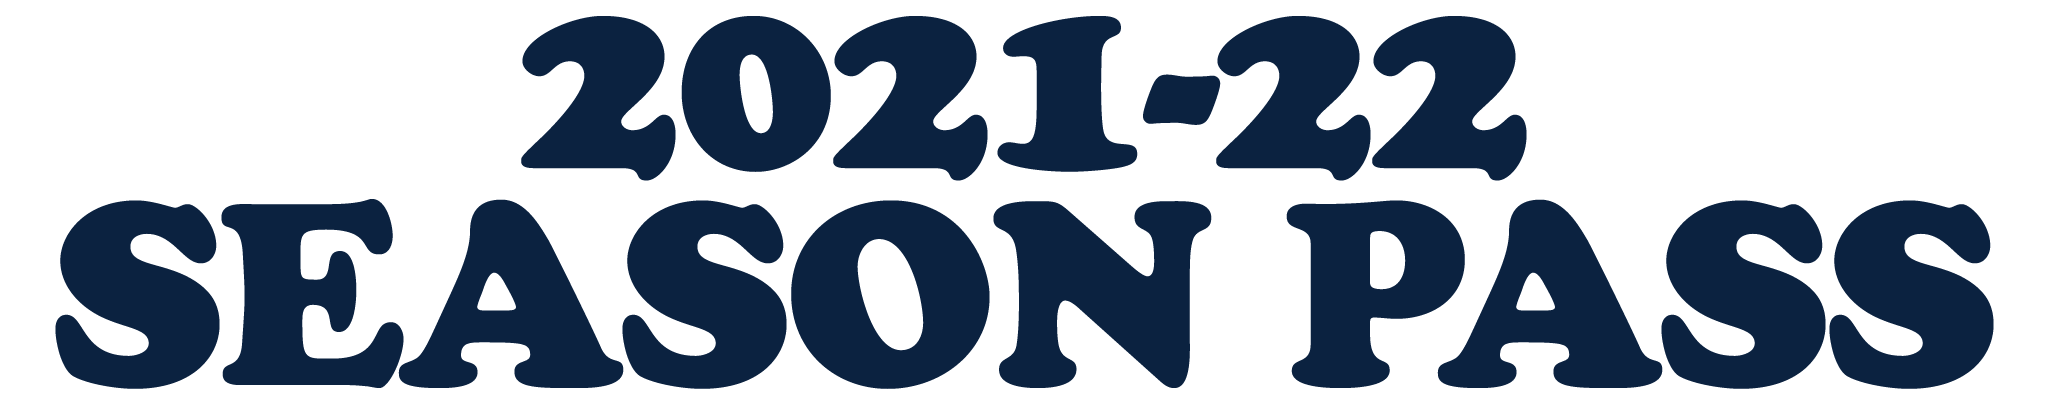 2021-22 Season Pass